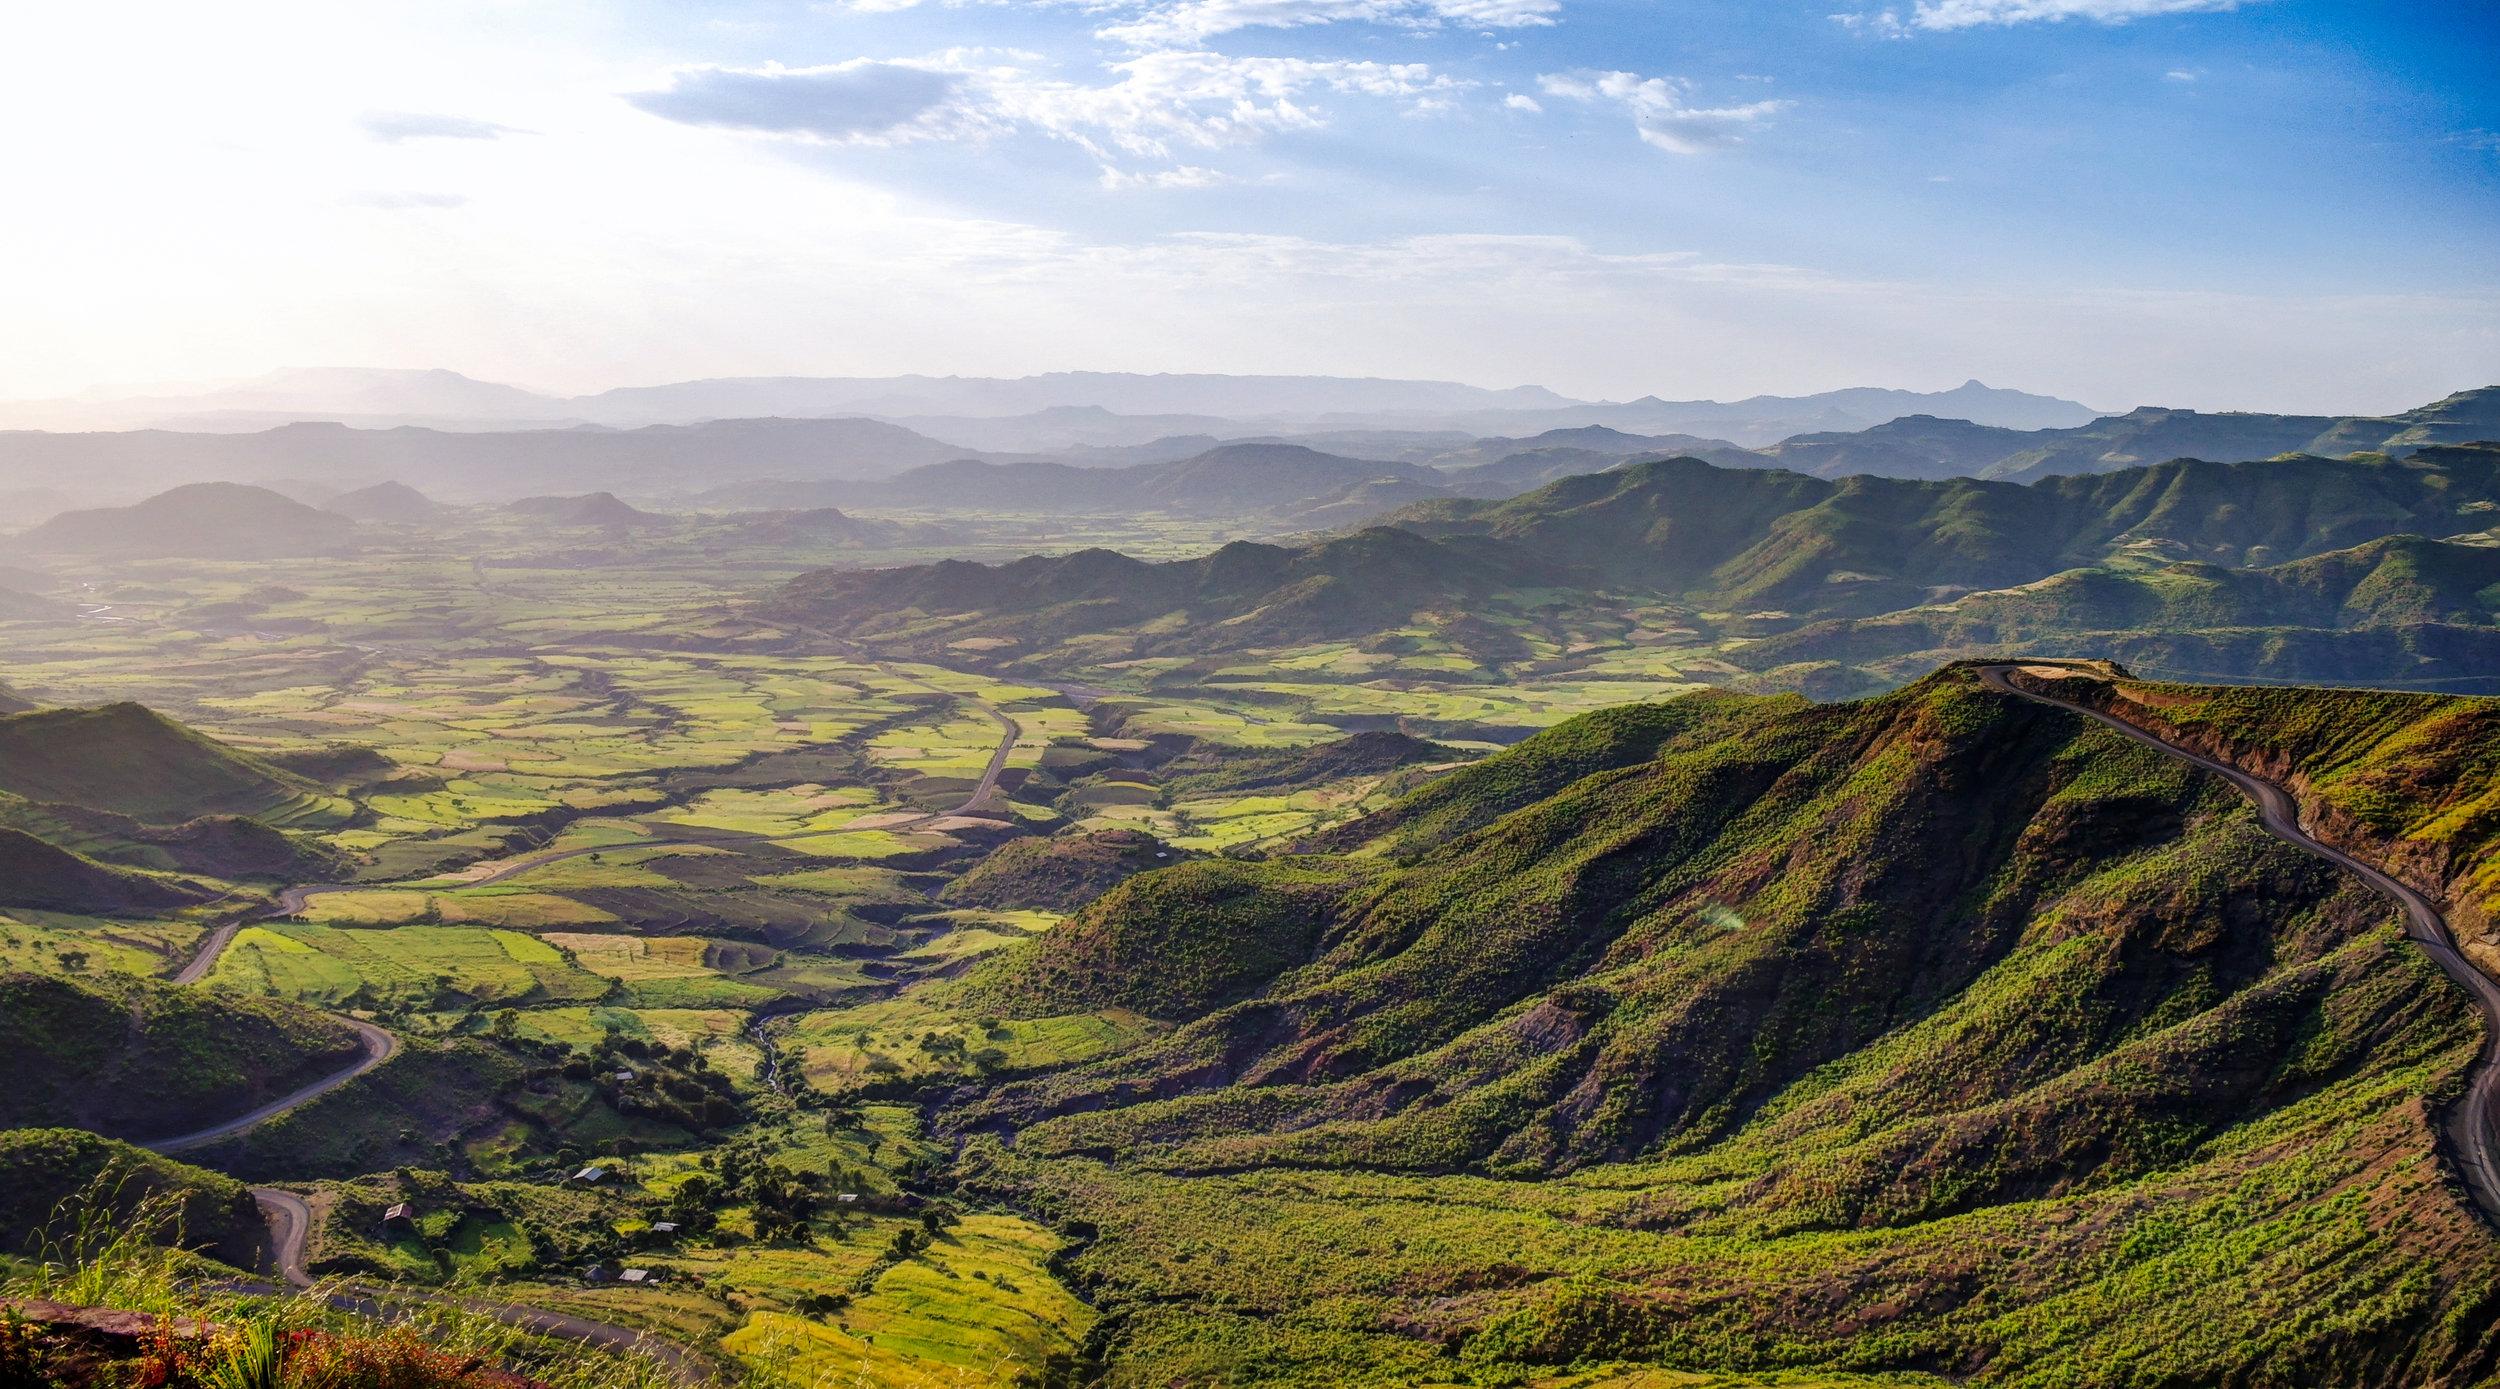 171031113729-ethiopia-travel-destination-photo.jpg